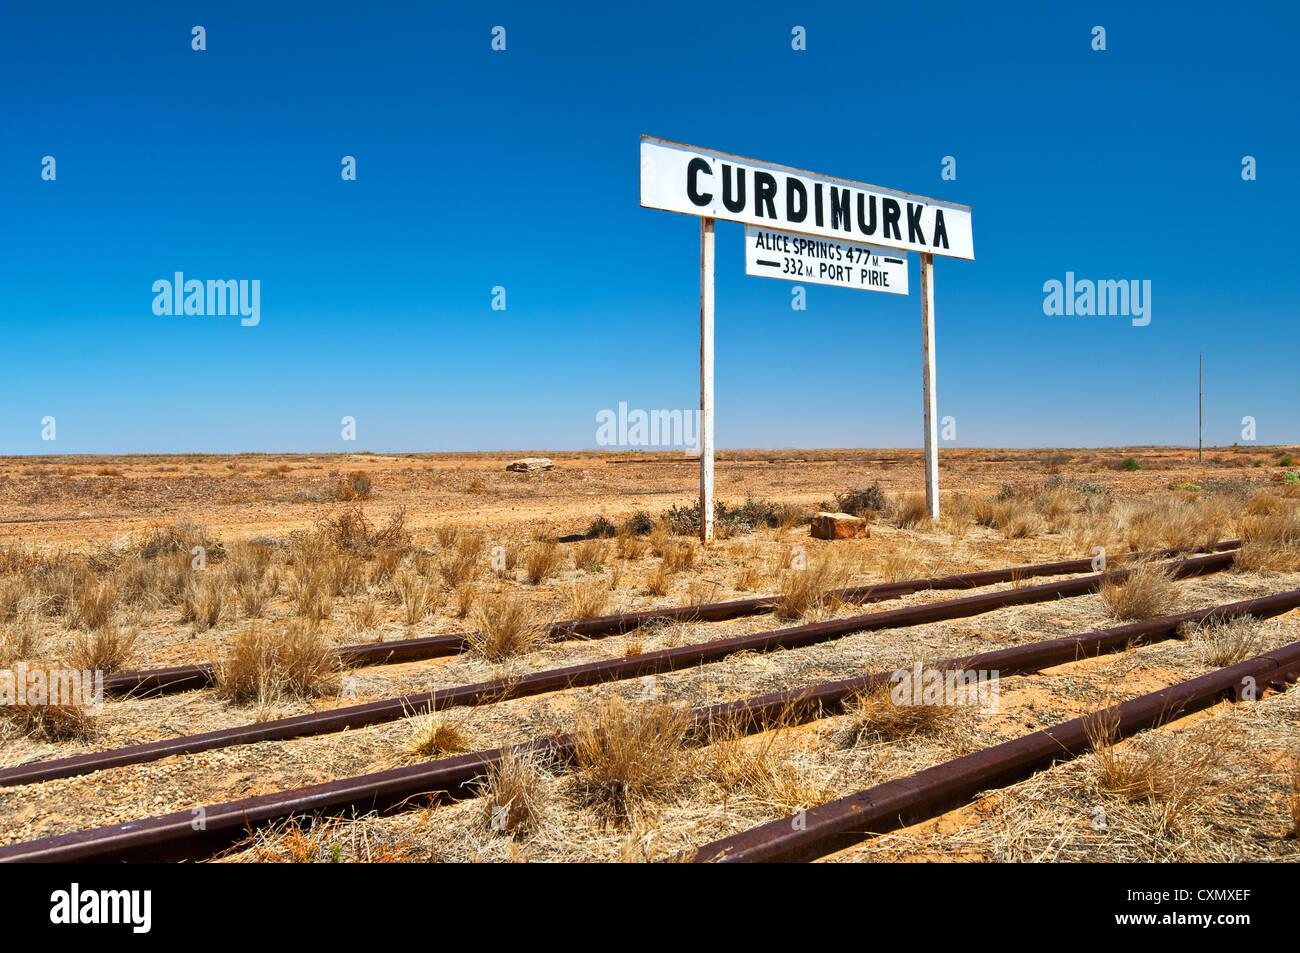 Signe de l'ancien vieux Ghan railway station Curdimurka. Photo Stock